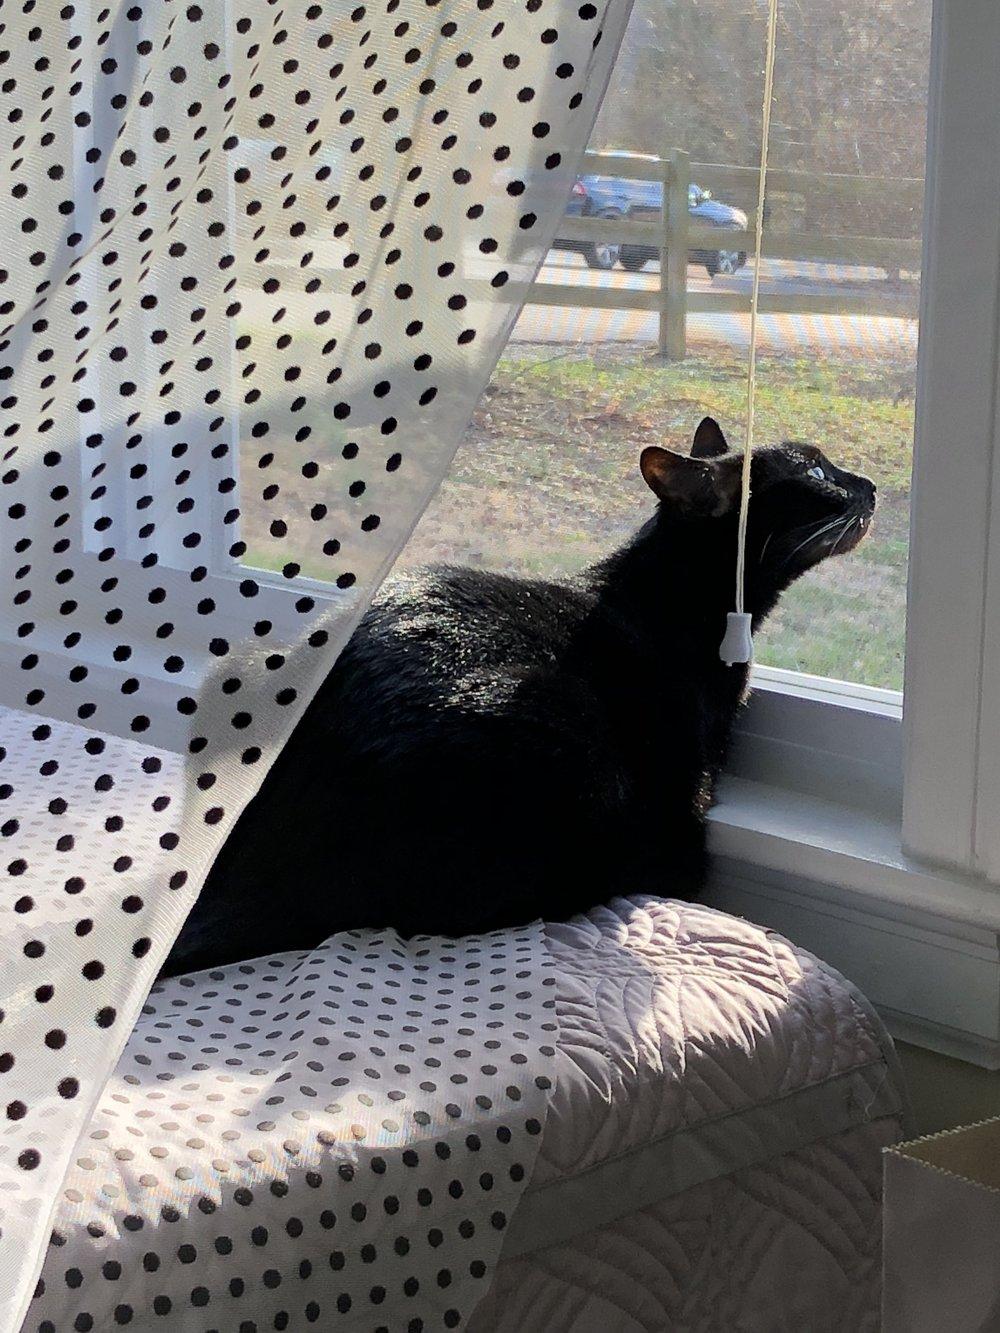 Elvira was enjoying the sunshine and warm breeze too!